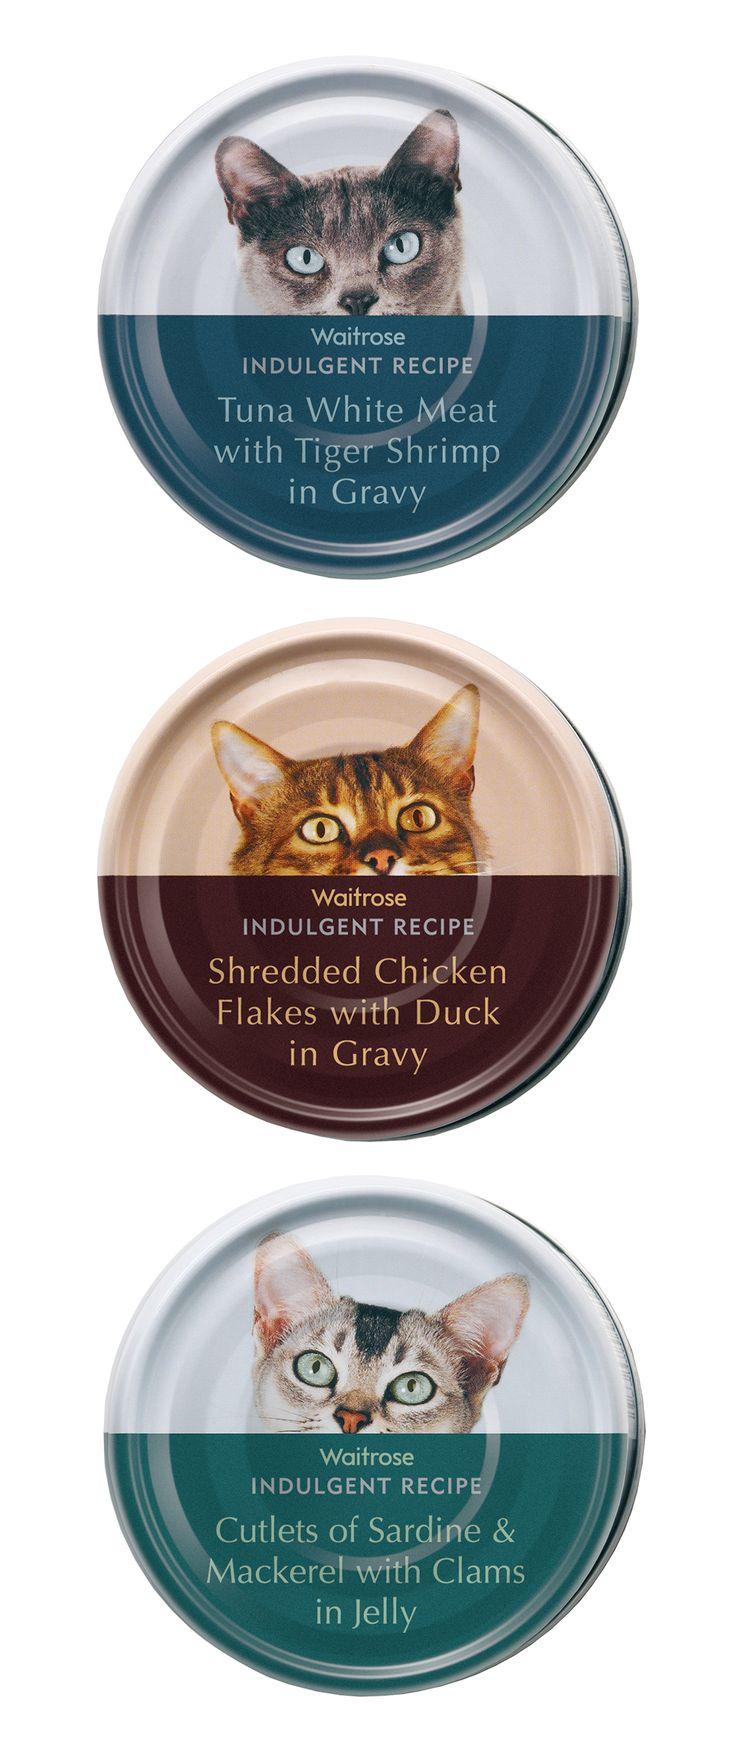 Agri cultures project logo duckdog design - Waitrose Cat Food Turner Duckworth England Pd